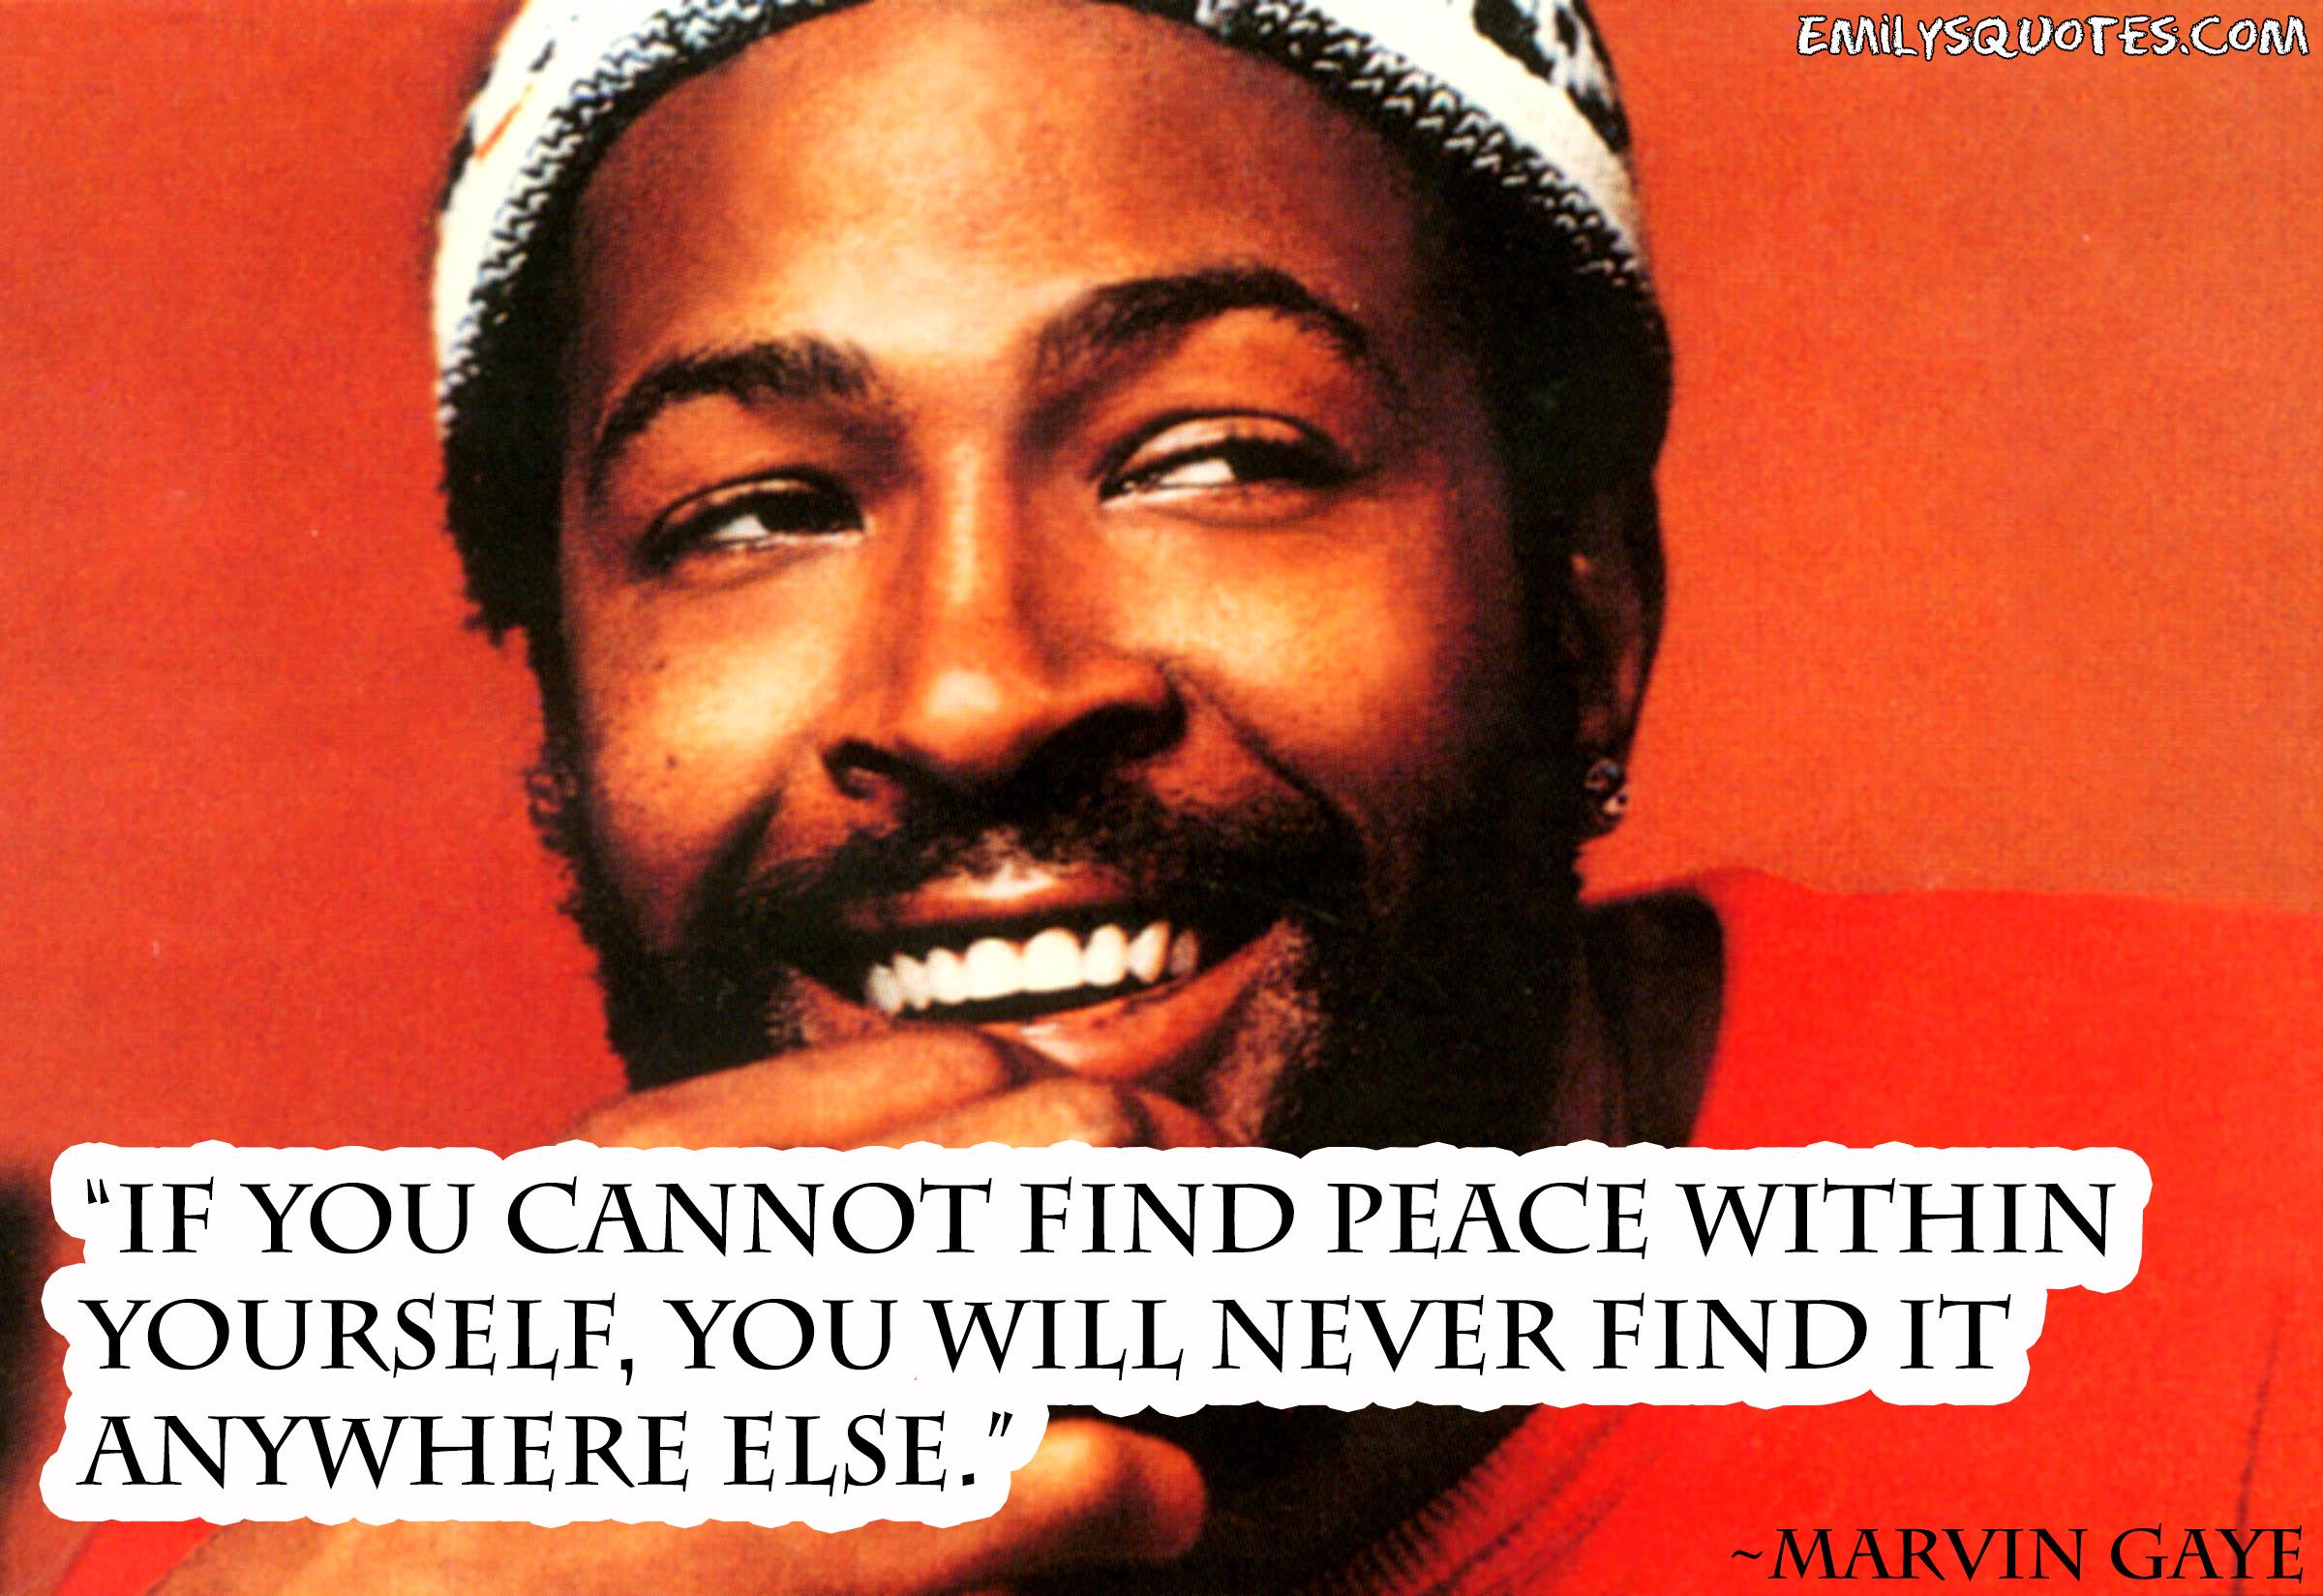 EmilysQuotes.Com - peace, yourself, wisdom, great, Marvin Gaye